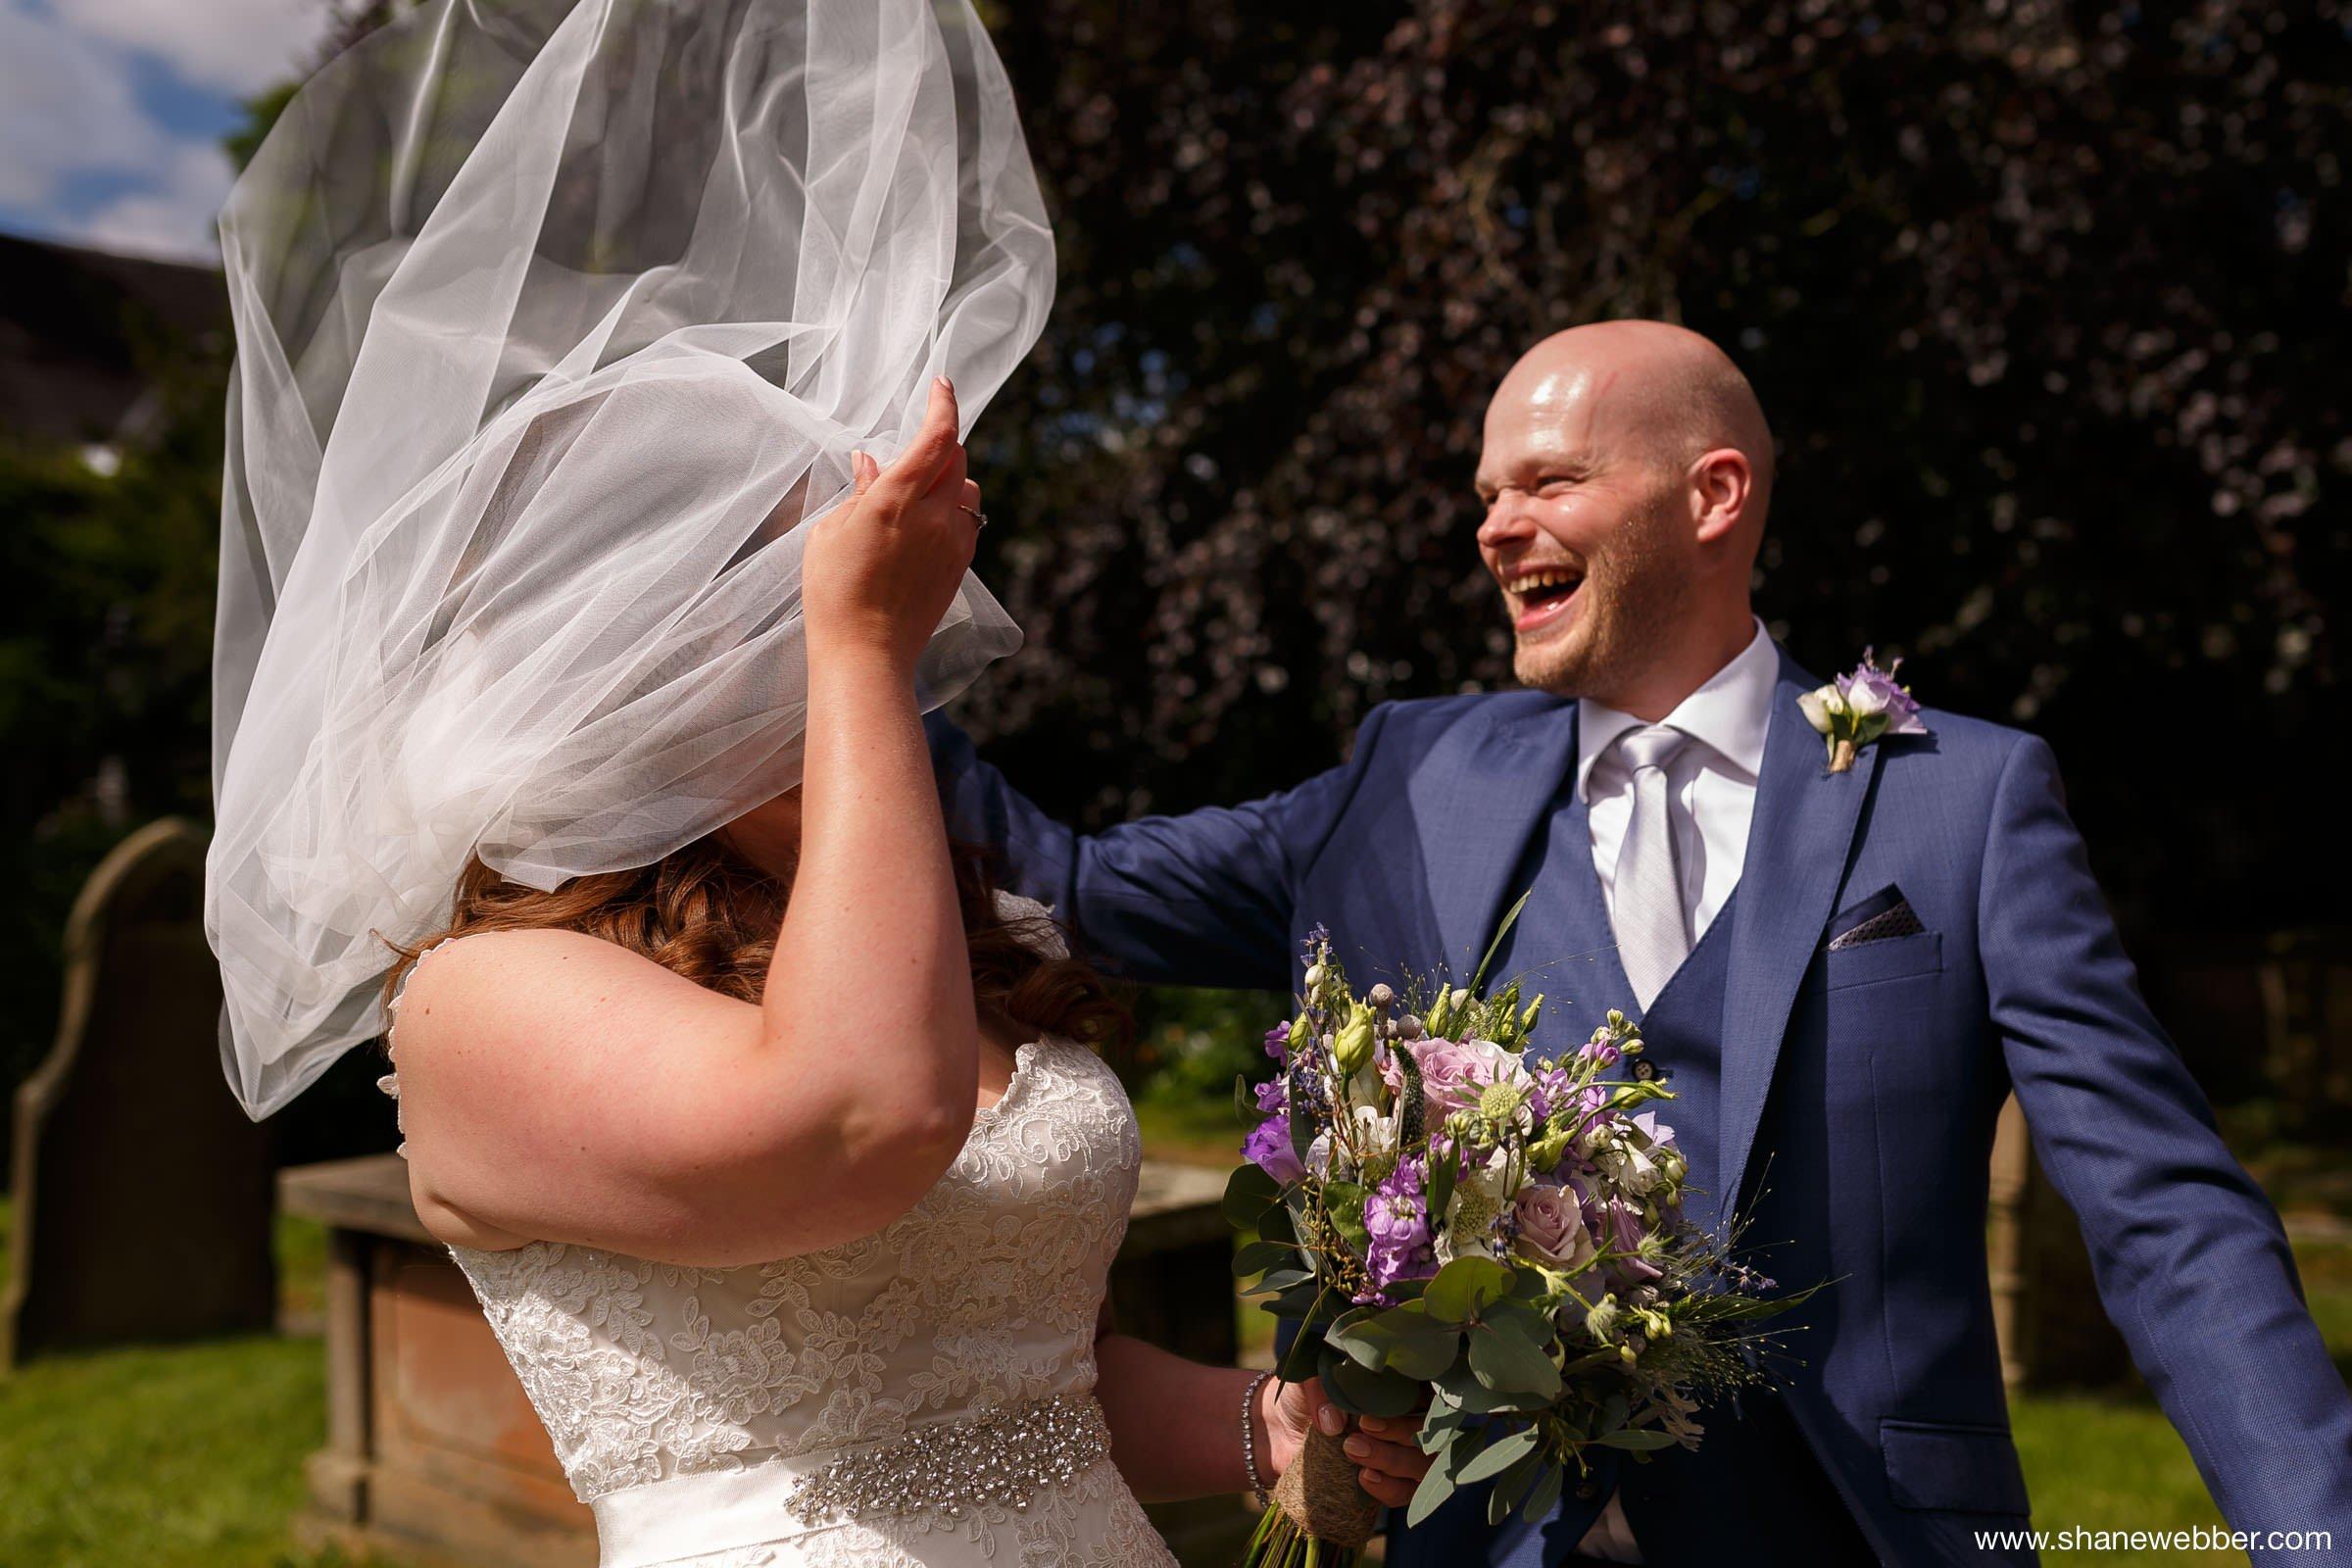 Funny wedding photo of bride and groom